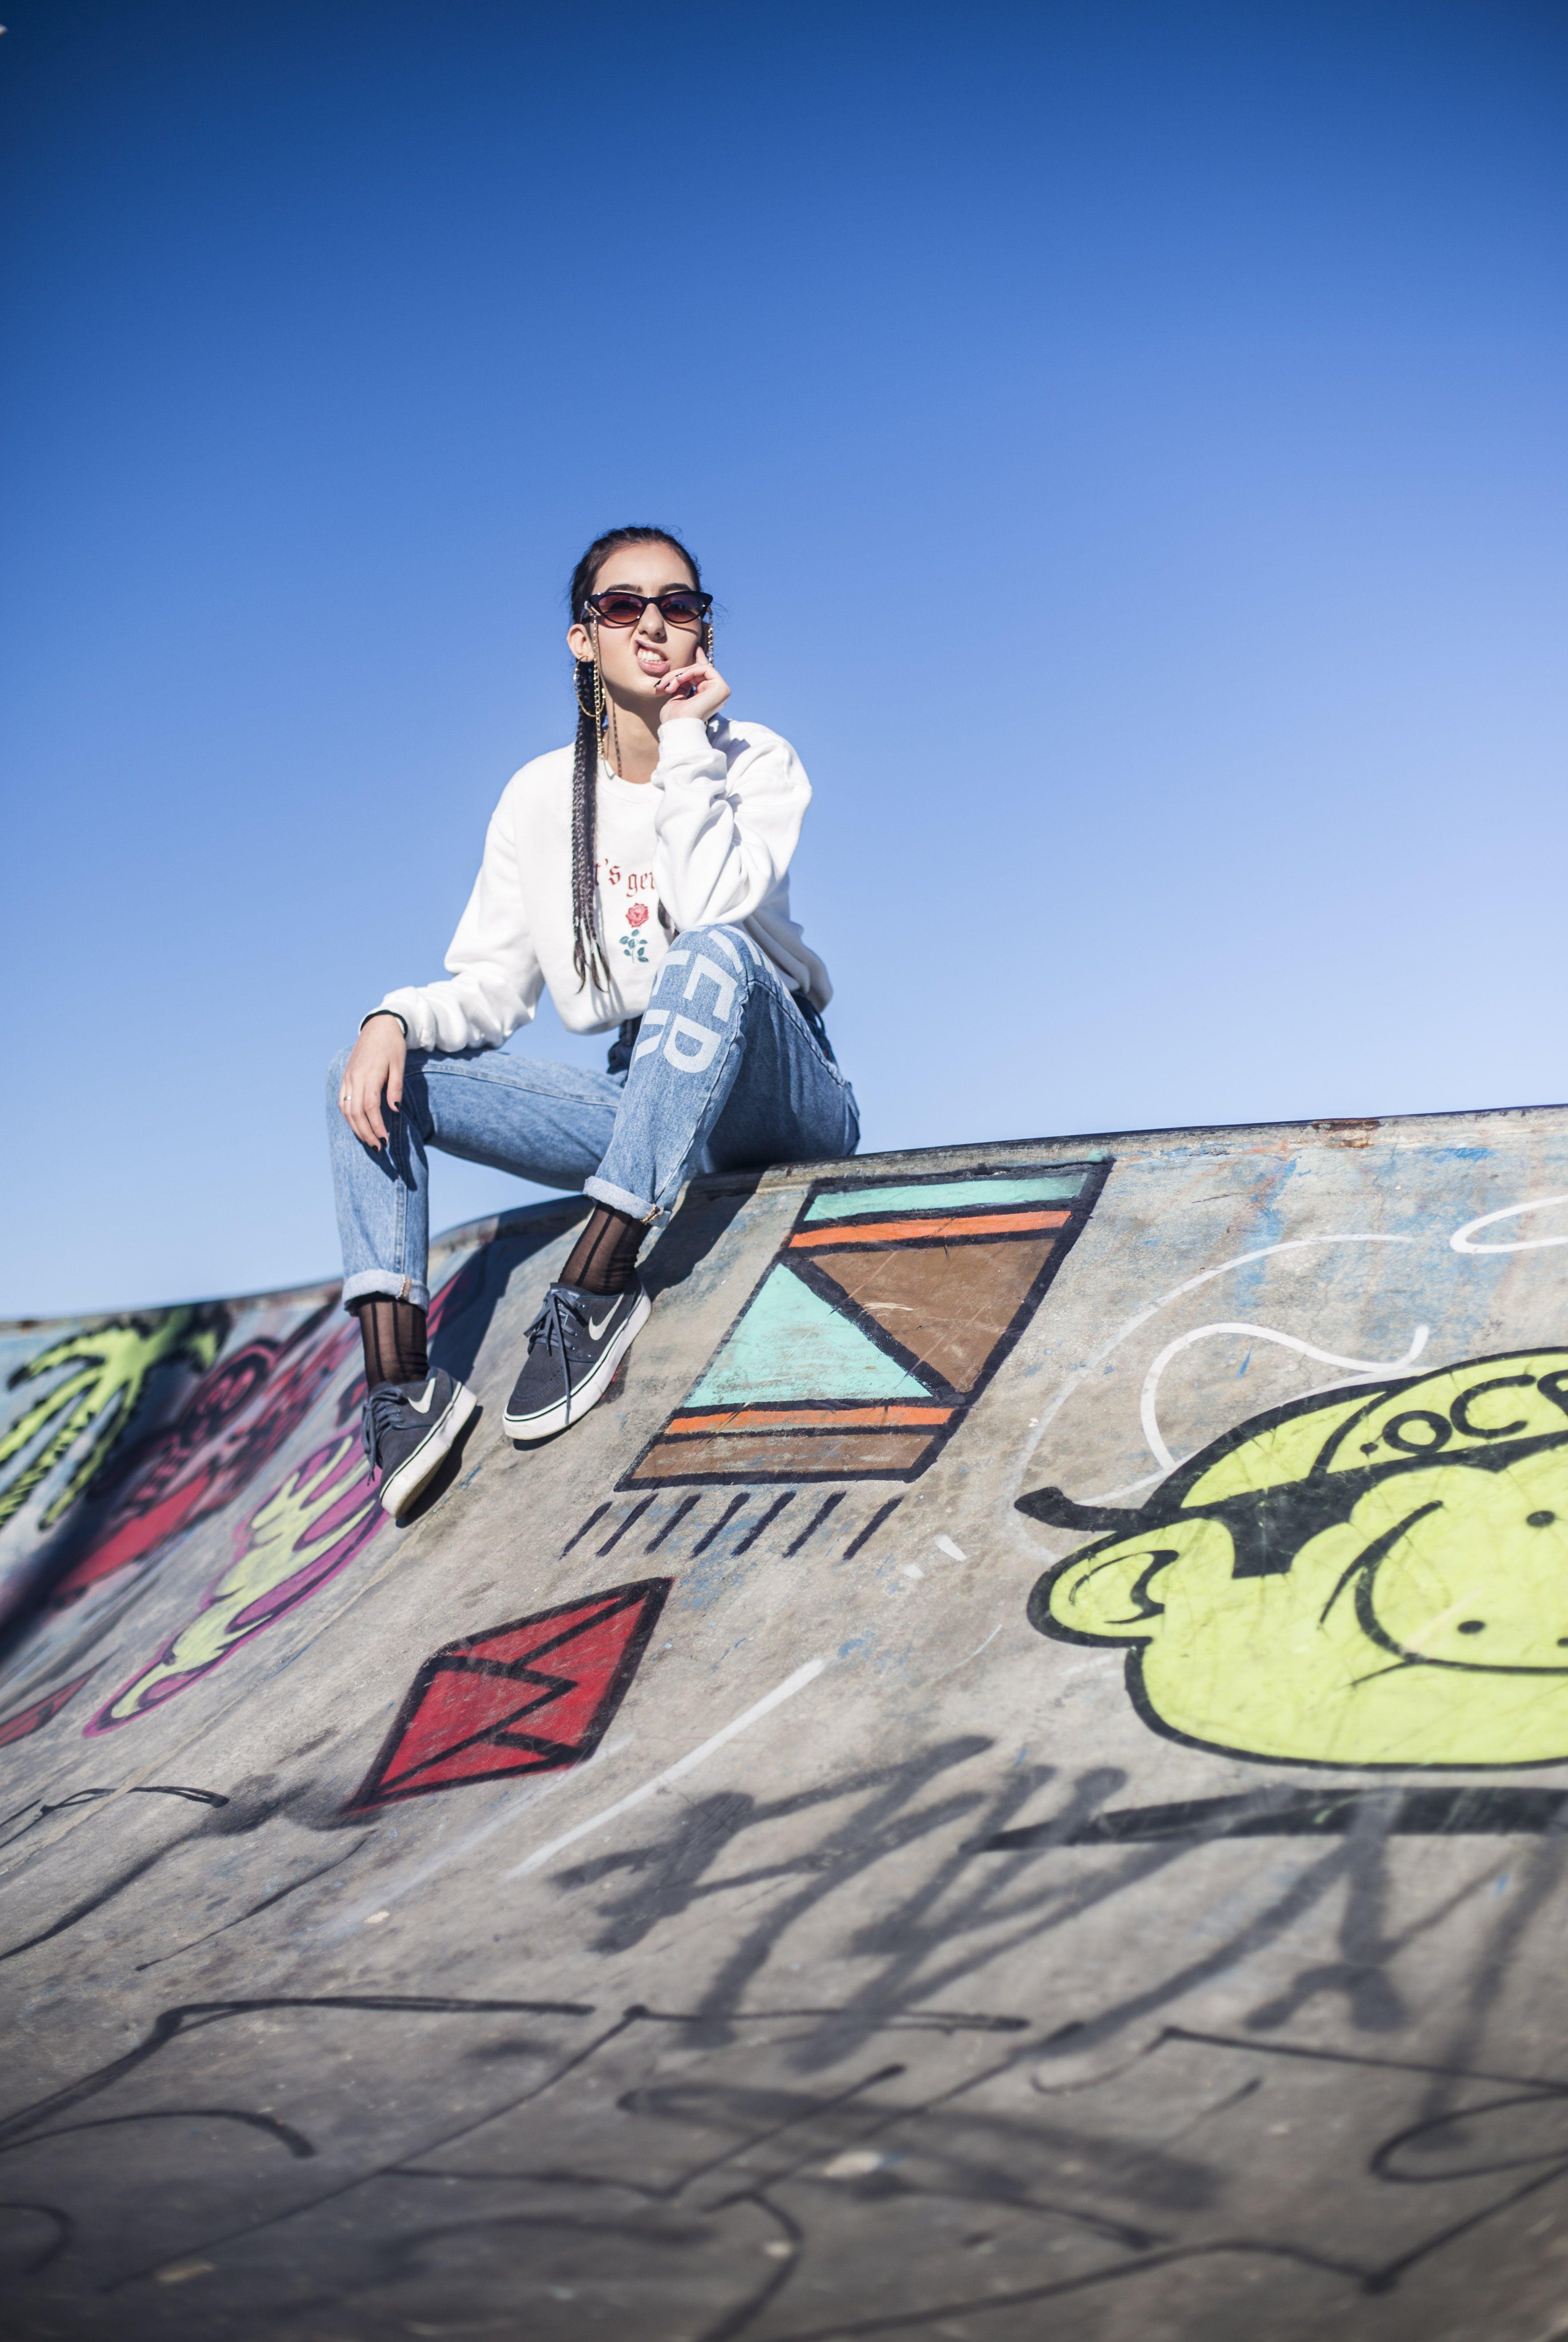 Woman Sitting on Graffiti Painted Skate Park